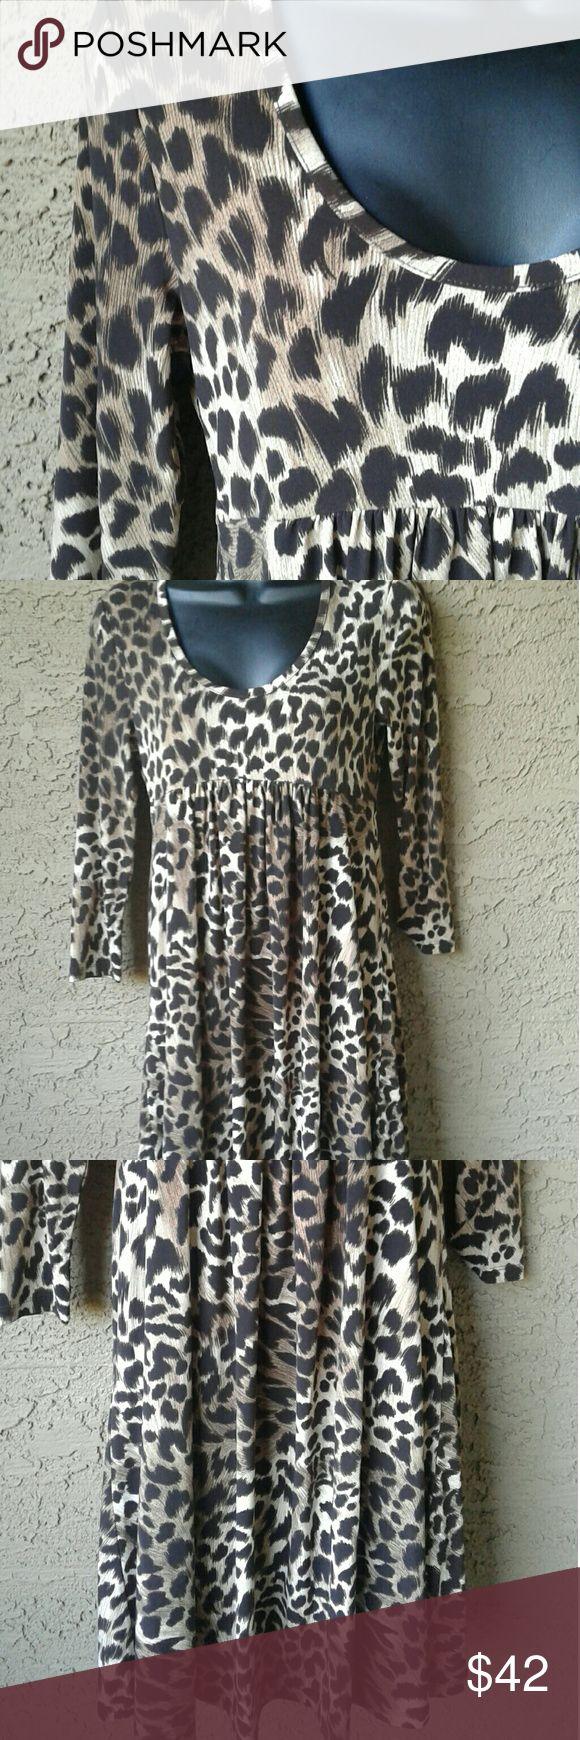 Michael kors cheetah dress Like new condition, size xs/xp, 37 in. Long, 94 % polyester, 6%spandex, Michael Kors Dresses